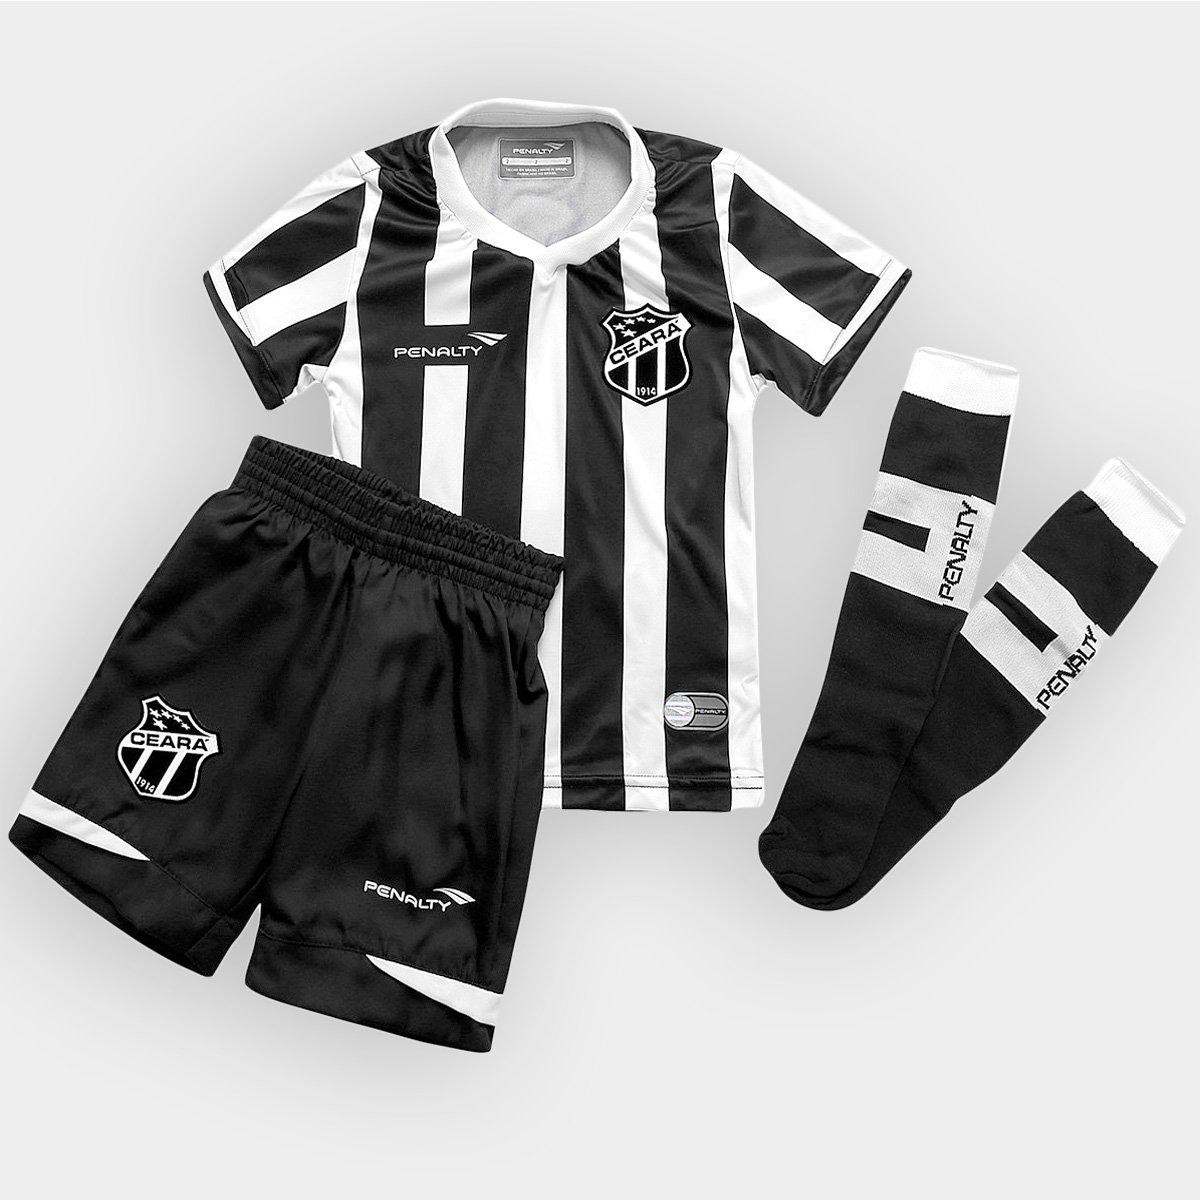 Kit Penalty Ceará I 2015 nº 10 Infantil - Compre Agora  c90e47d0a5bce